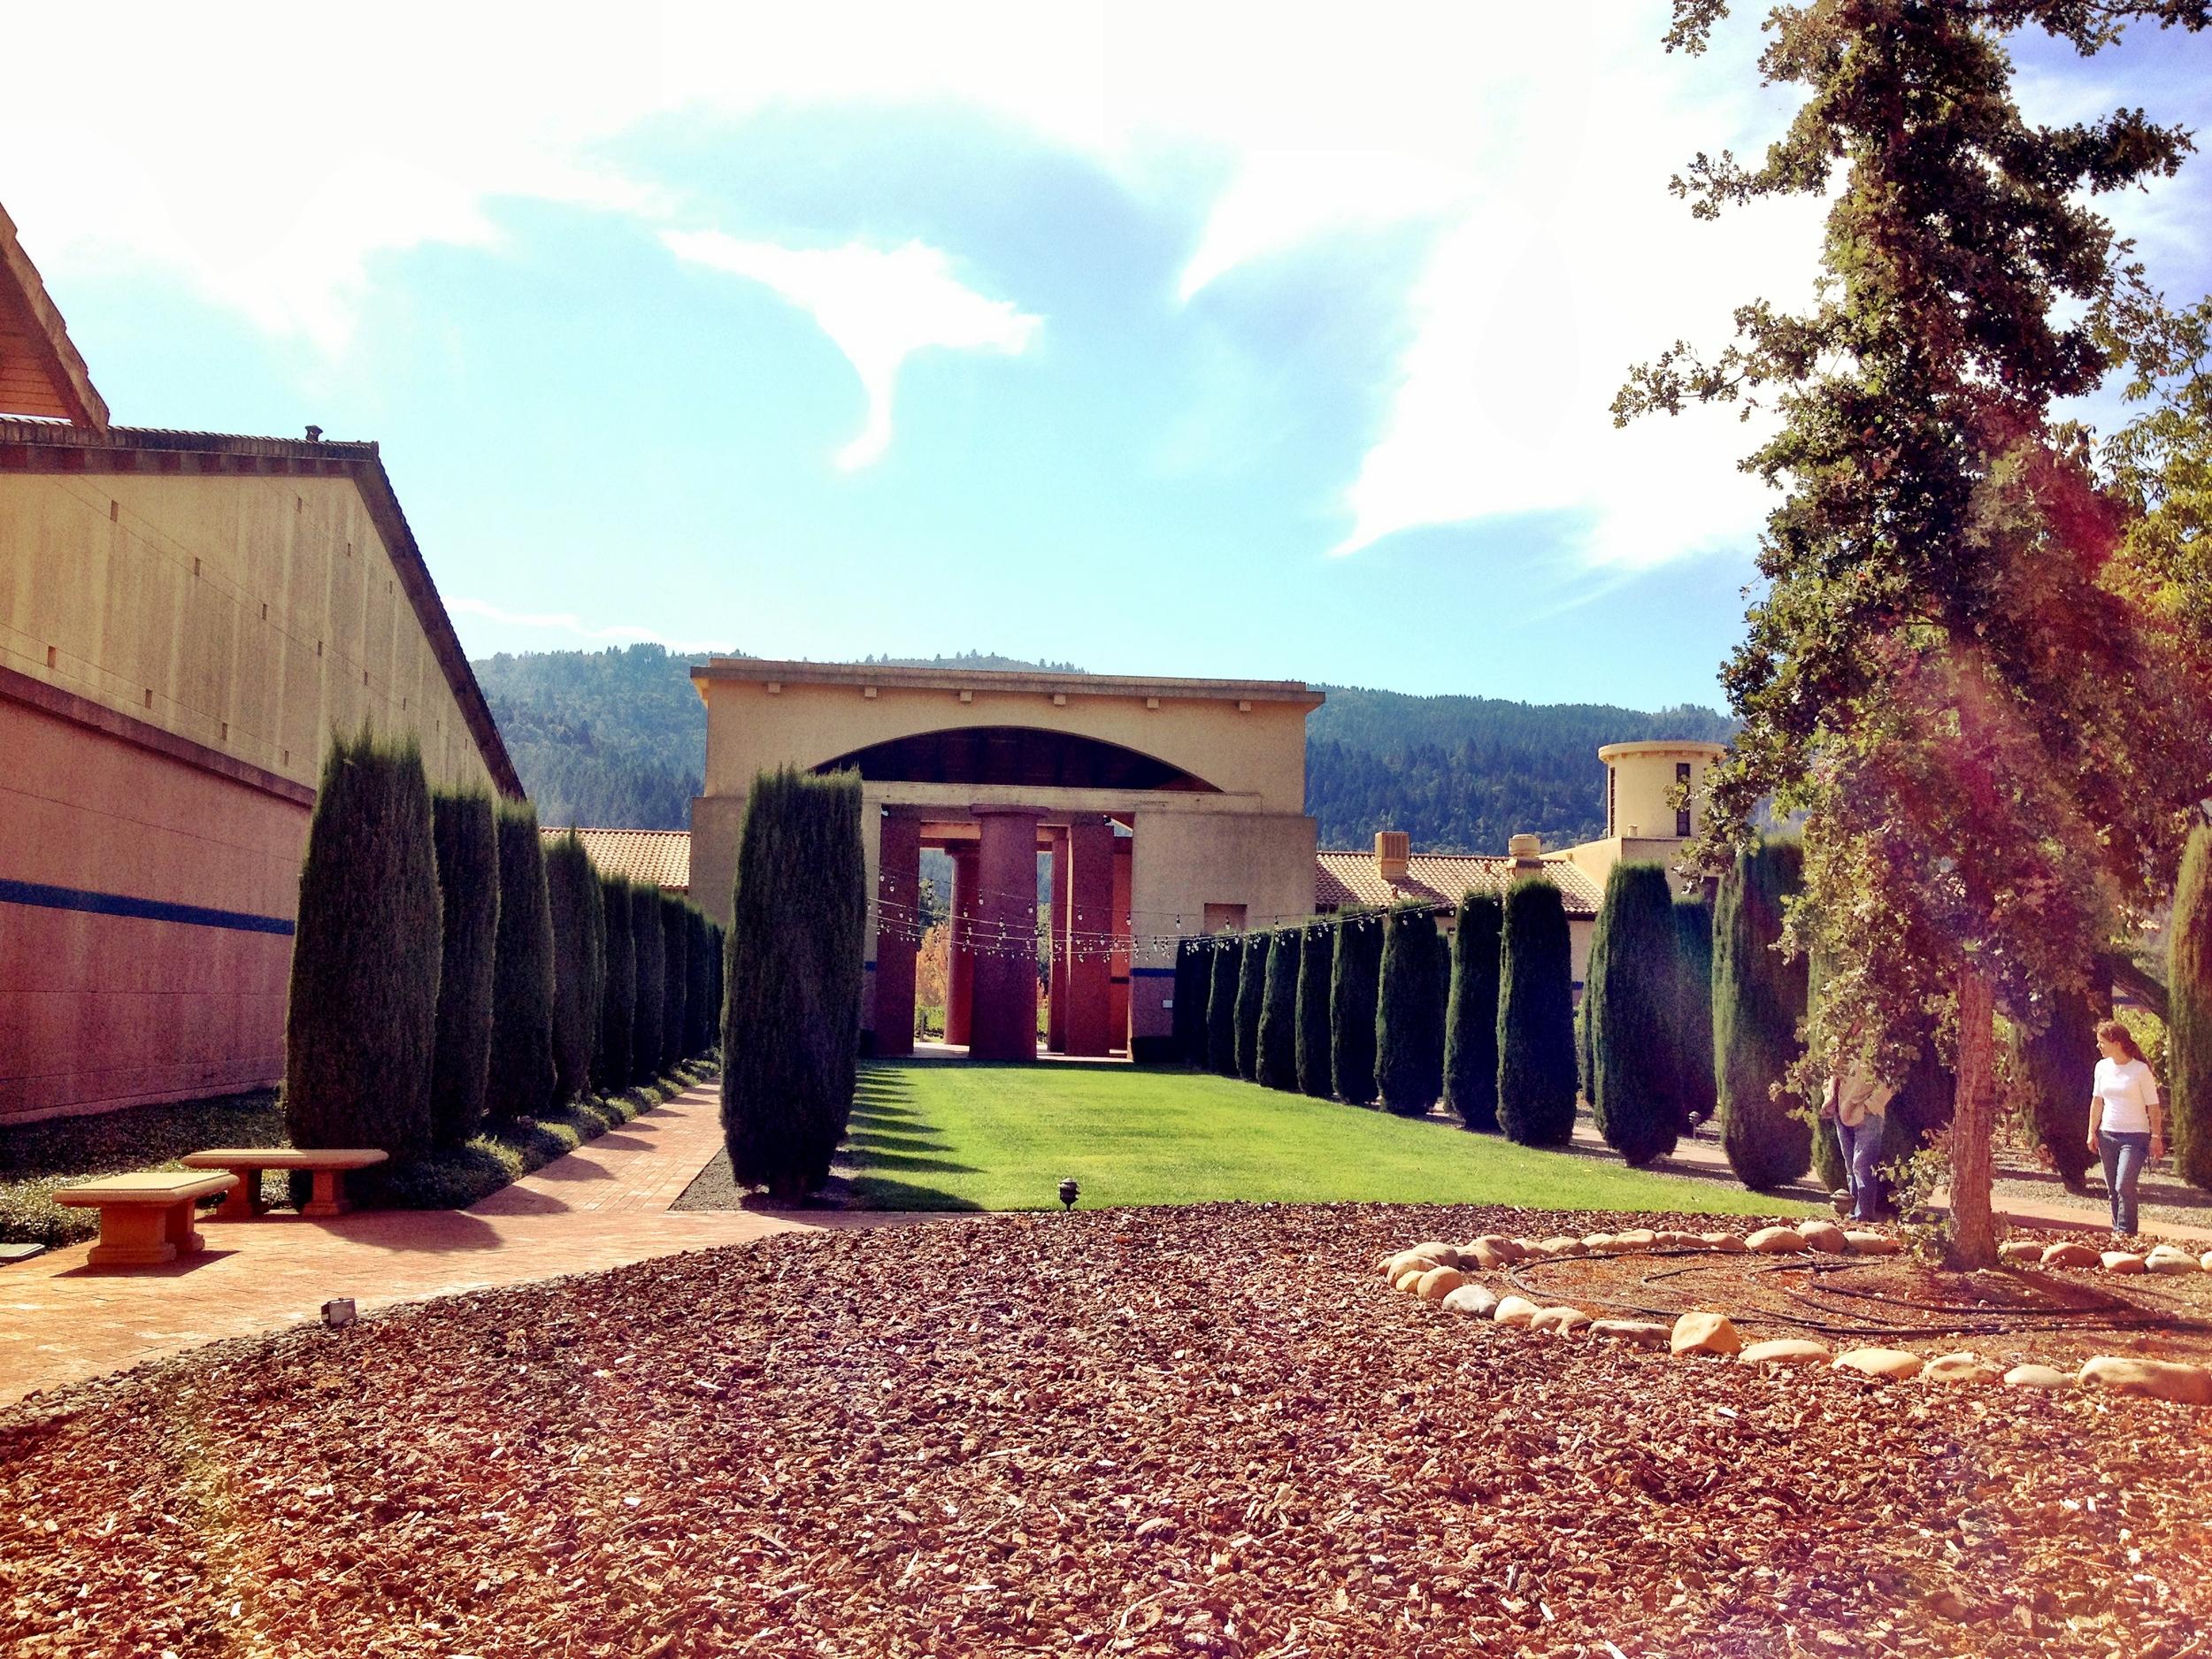 Winery Clos Pegase California Napa